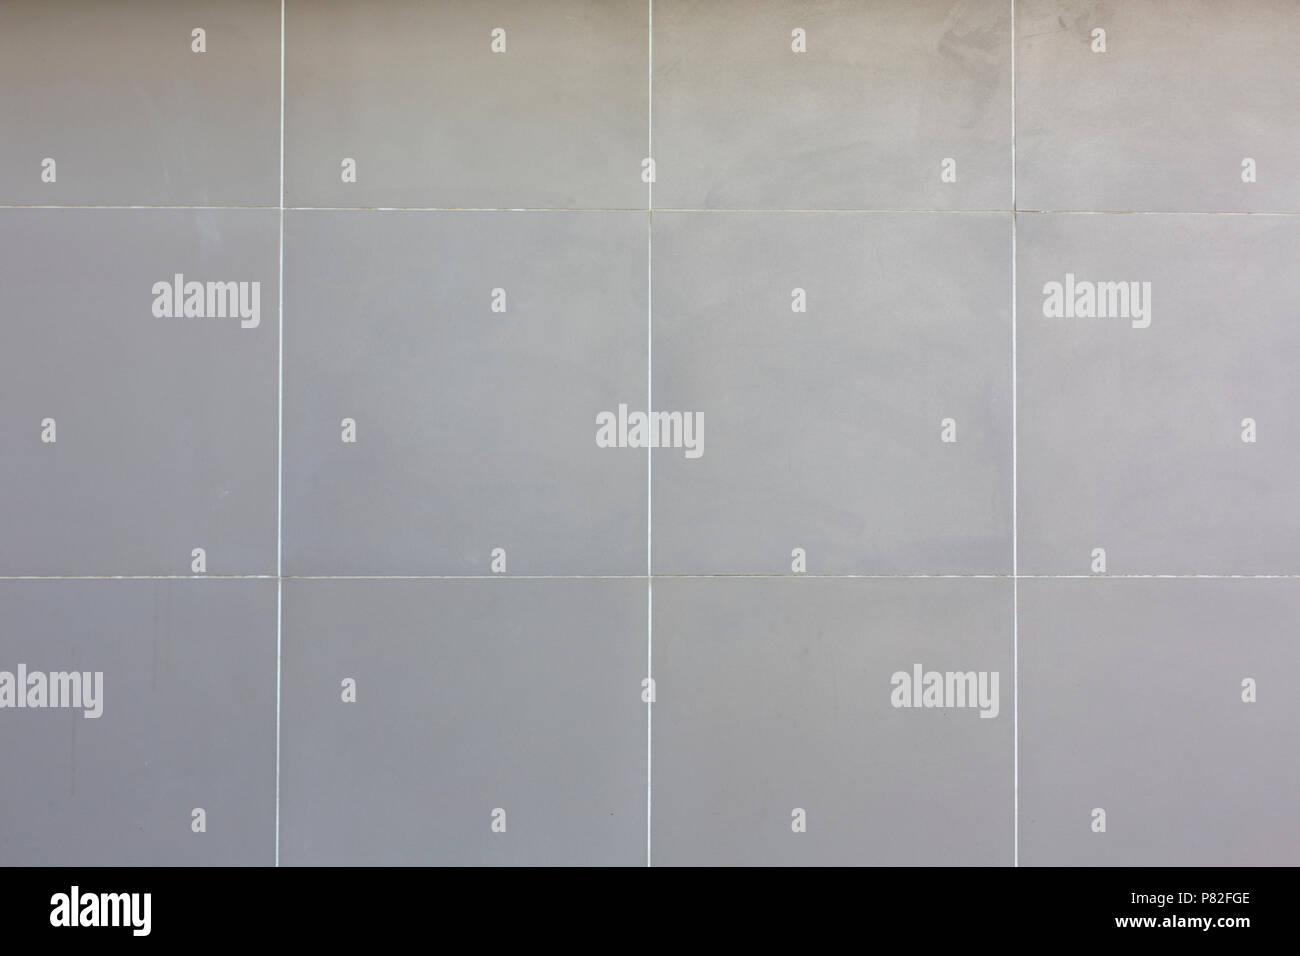 White Ceramic Tiles Square Pattern Texture Background